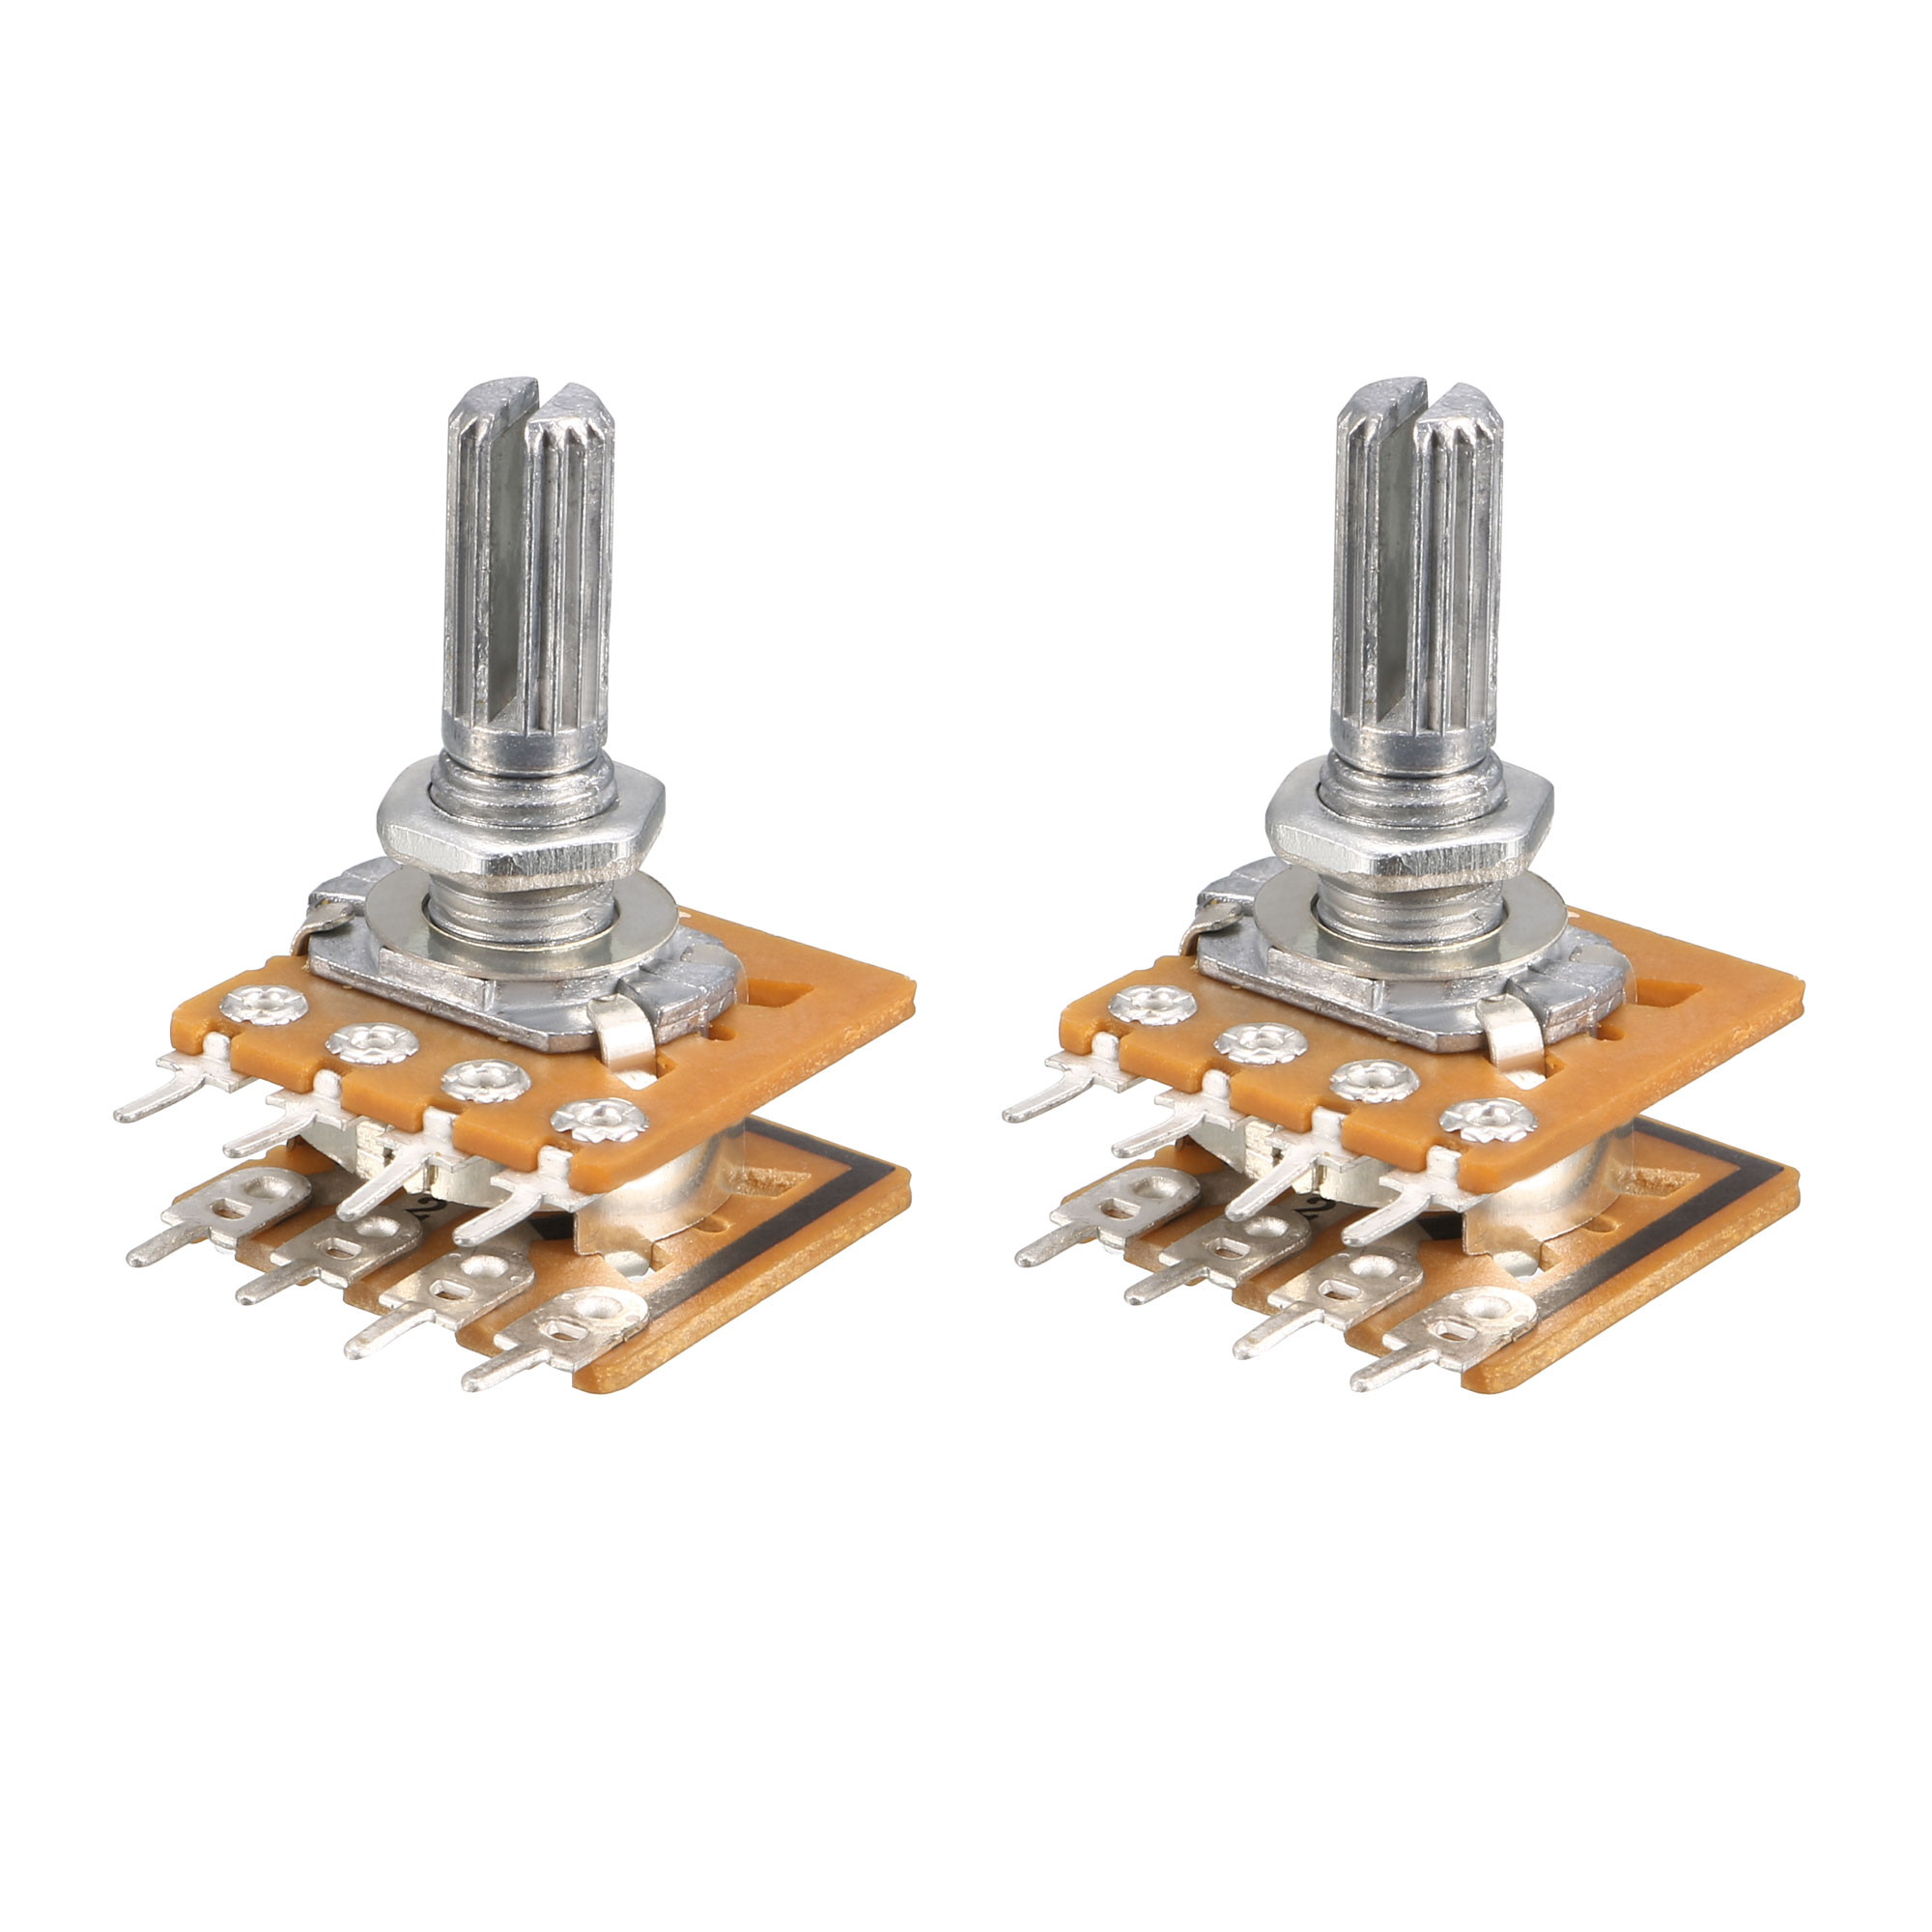 2 Pcs Knurled Shaft Dual Taper Linear Potentiometer 50K ohm B50K